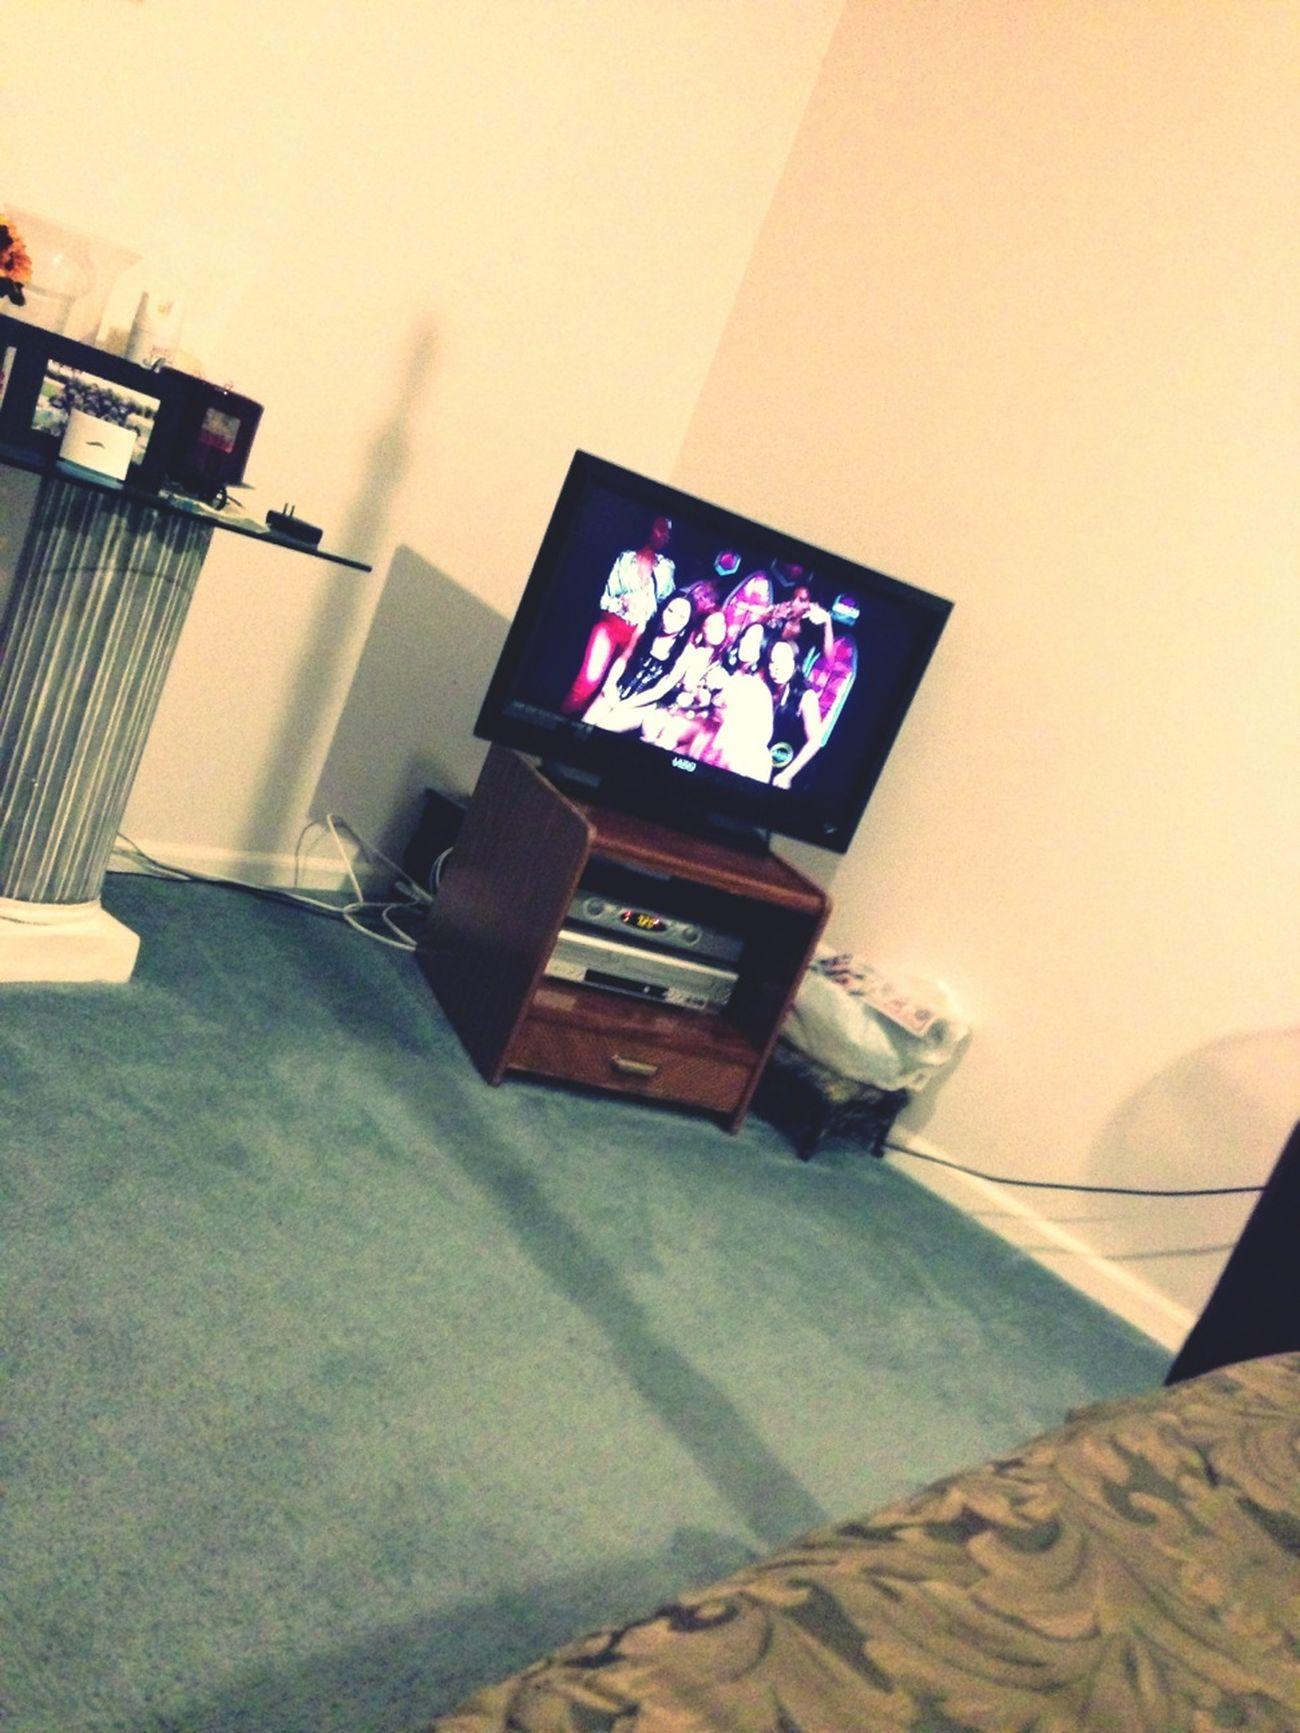 BGC On My Tv